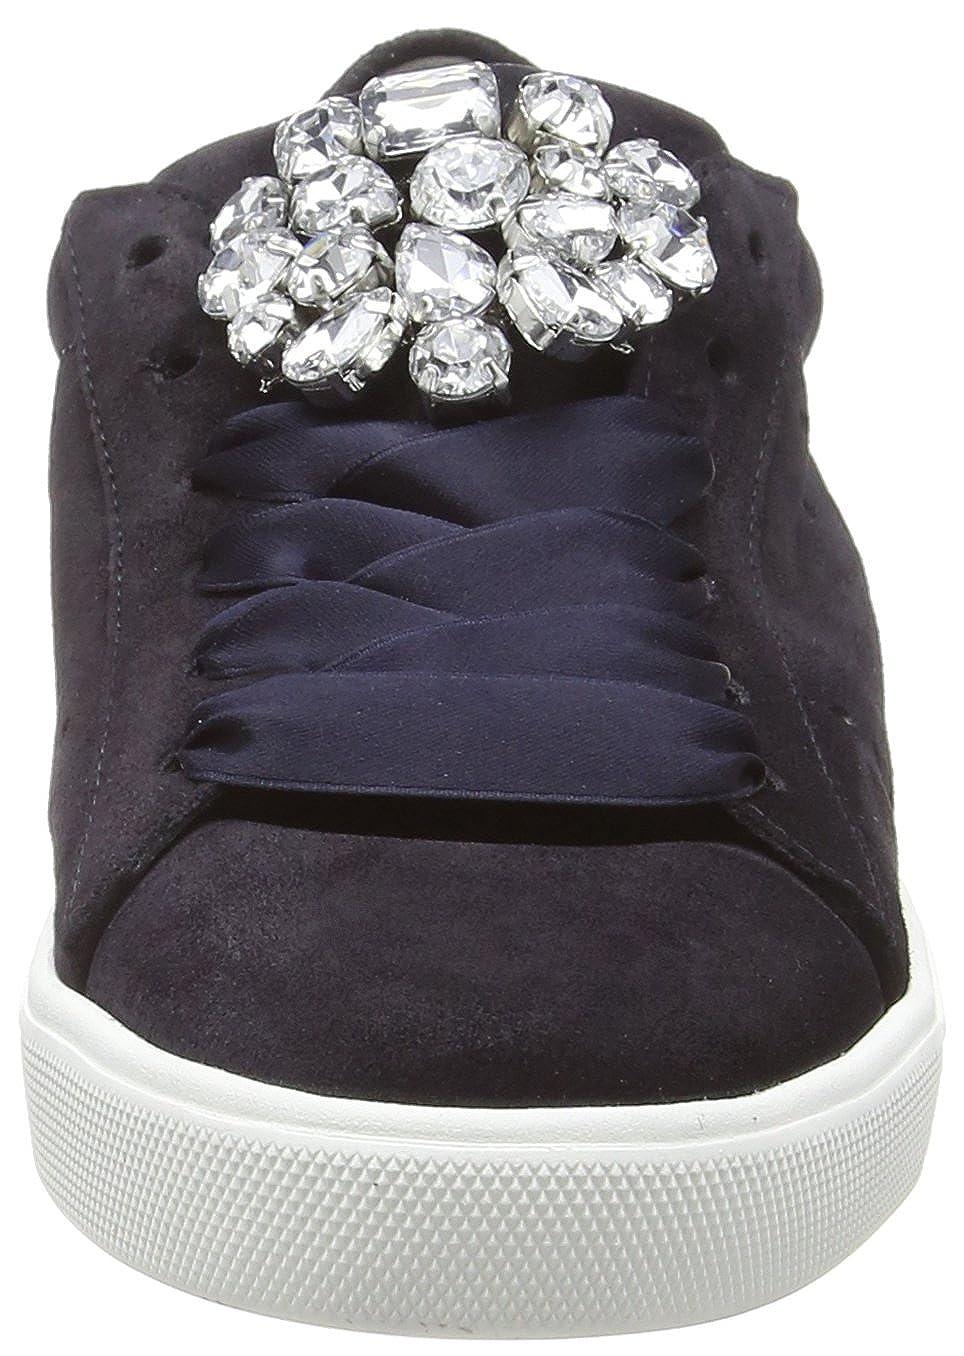 748 Kennel und Schmenger Women/'s Town Low-Top Sneakers Blue Blau Pacific//Crystal Sohle Wei/ß 7.5 UK